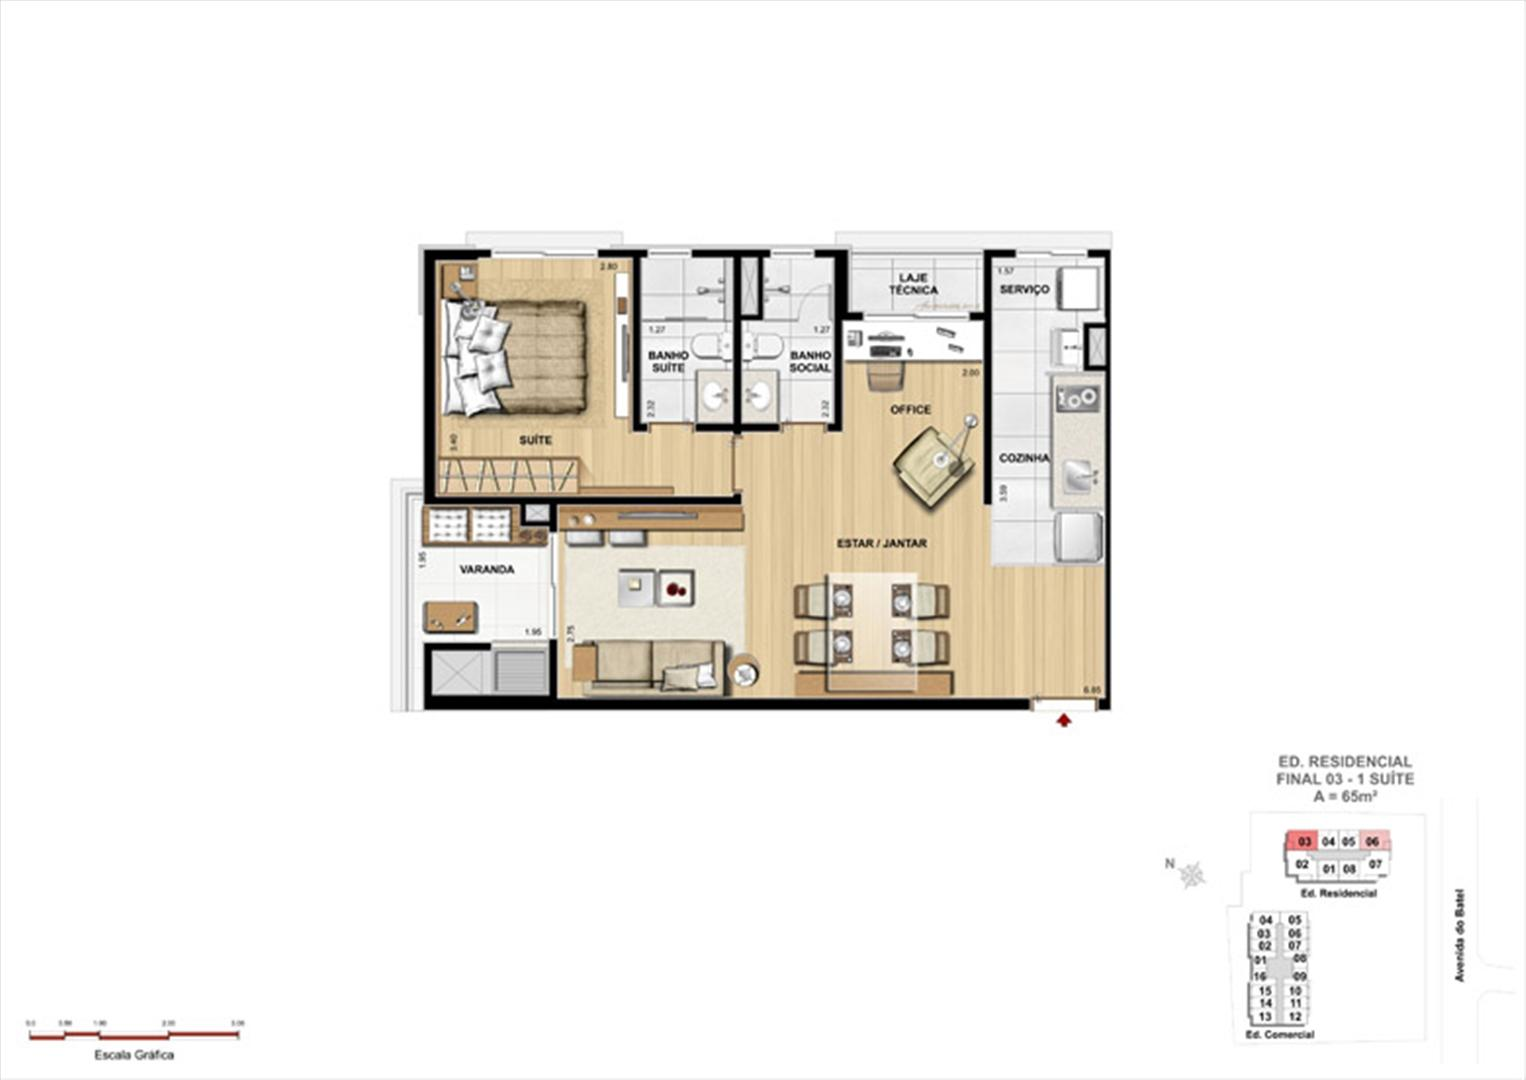 Apartamento 1 Suíte | 1550 Batel (Home Batel) – Apartamento no  Batel - Curitiba - Paraná